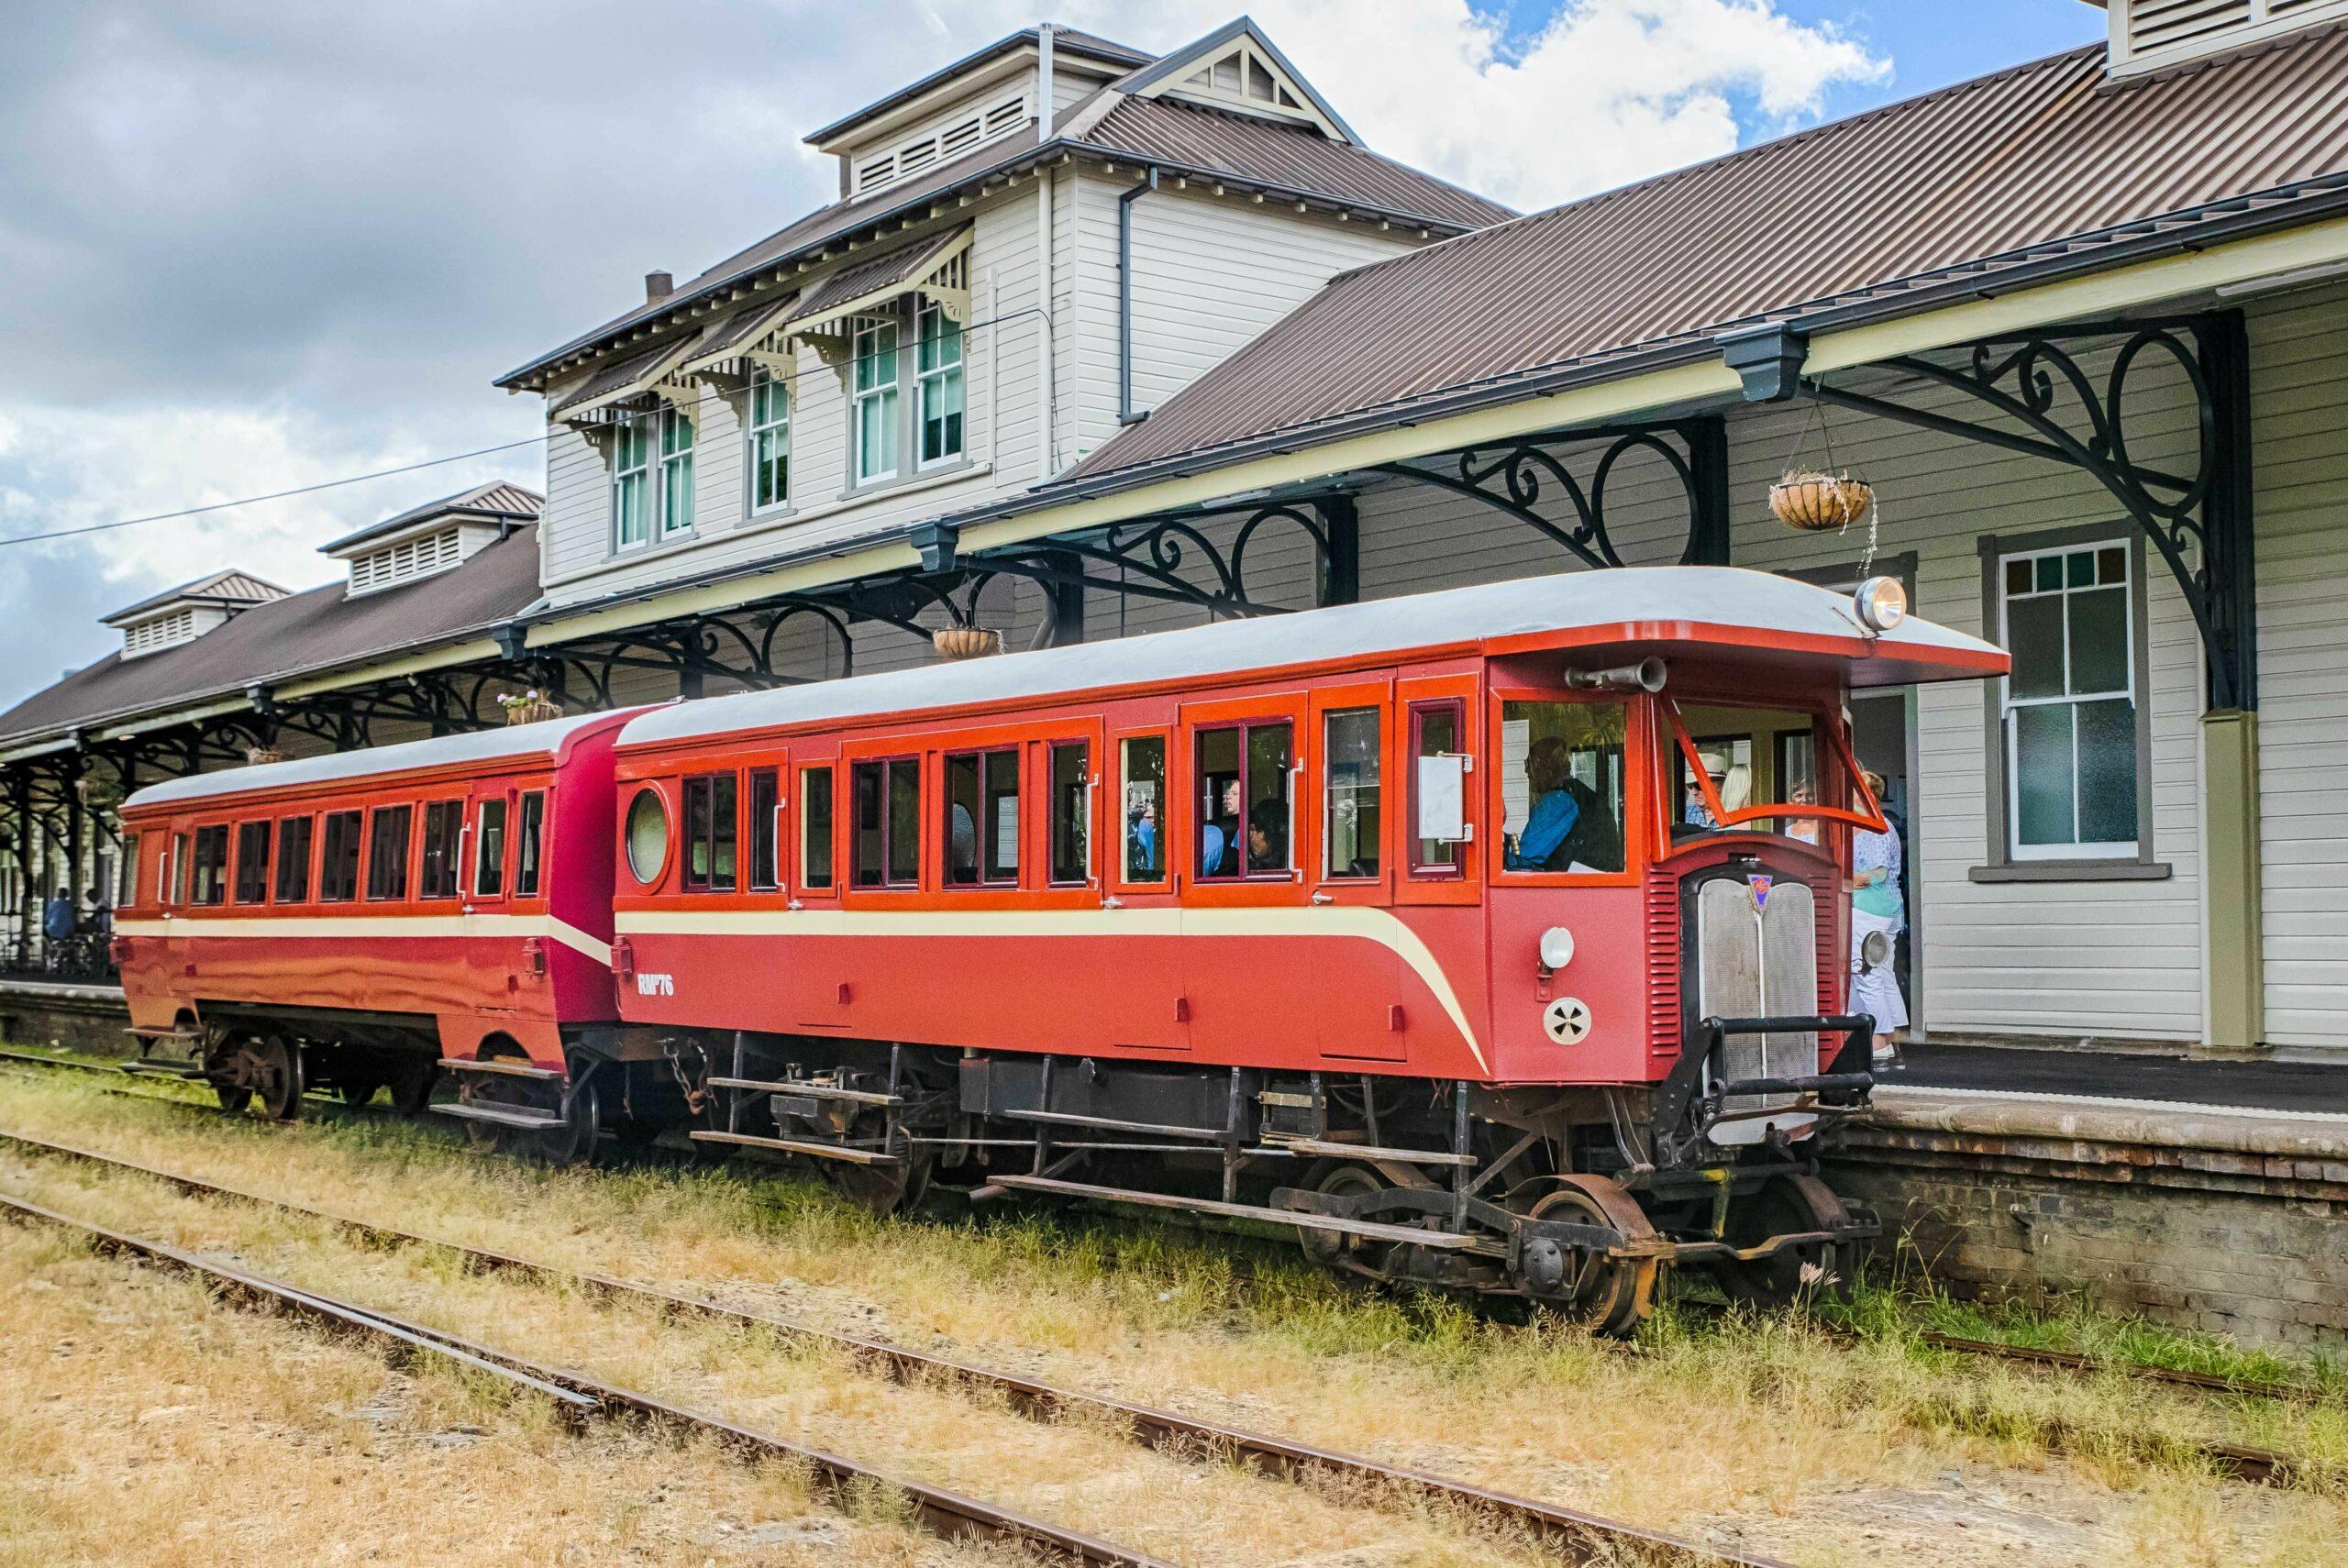 The Rattler Tasting Train - Departs Thursdays 10:00am Gympie to Amamoor (Return)